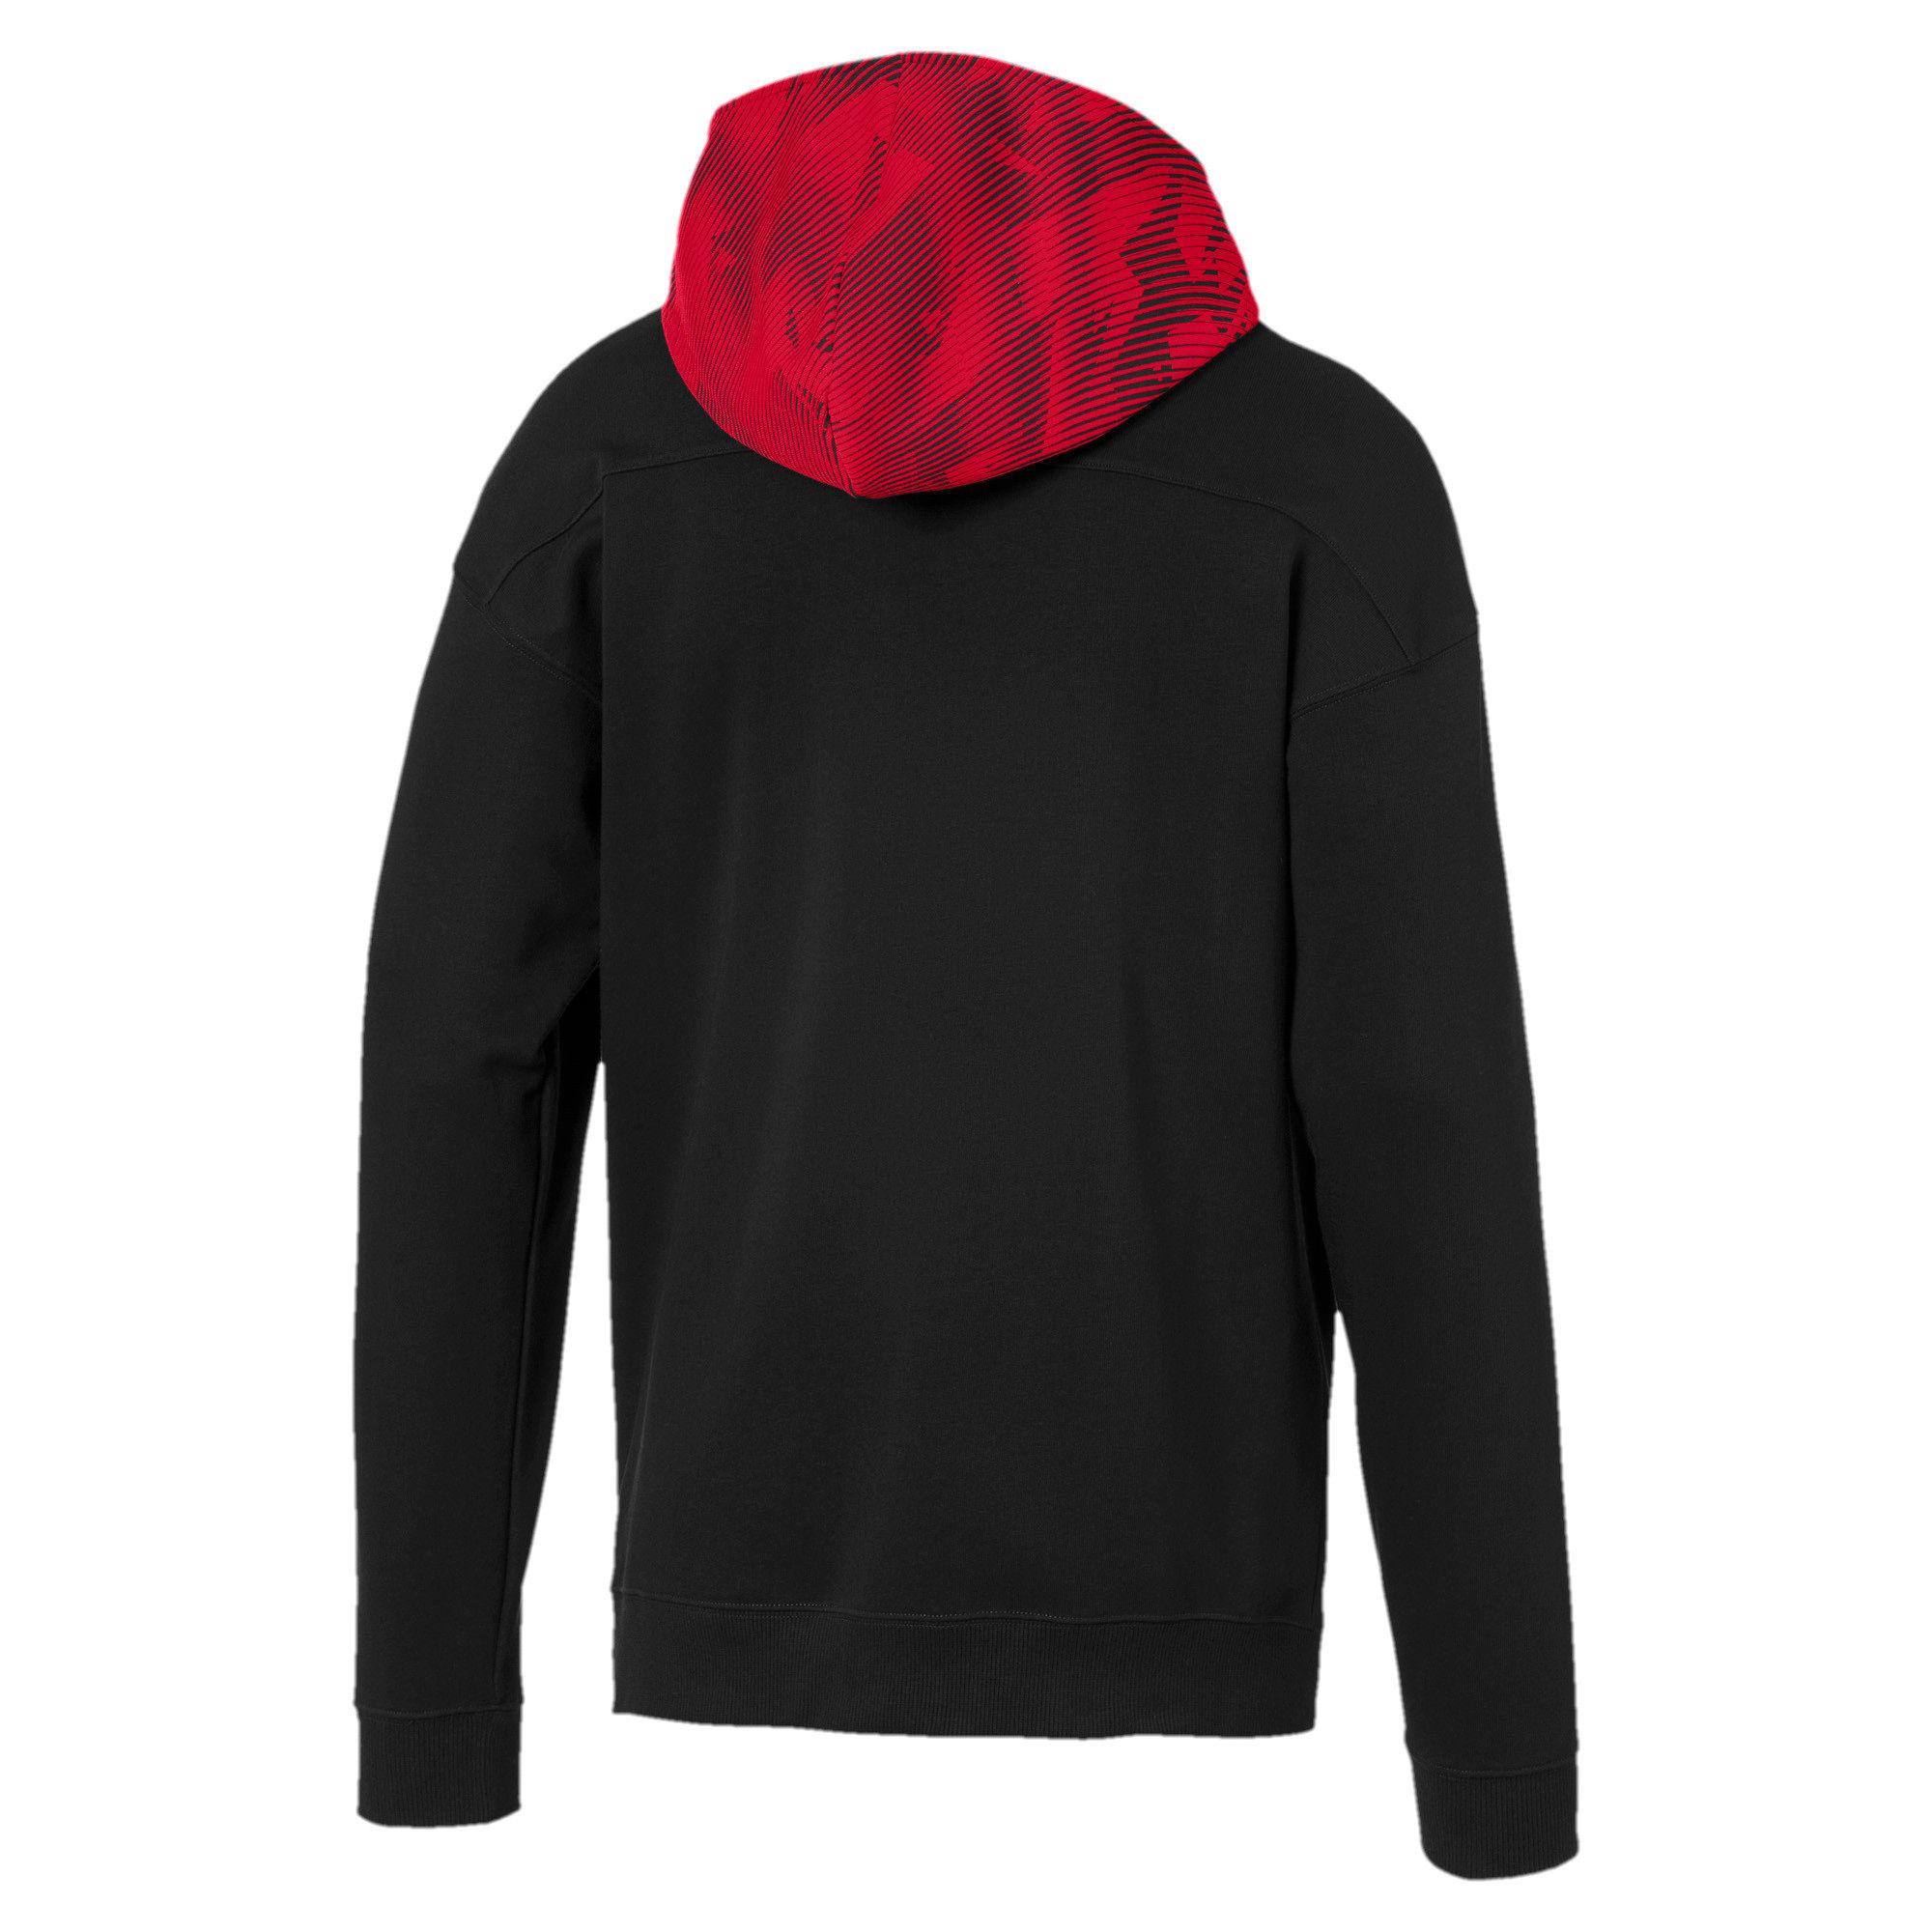 Thumbnail 5 of AC Milan Casuals Men's Hoodie, Puma Black-Tango Red, medium